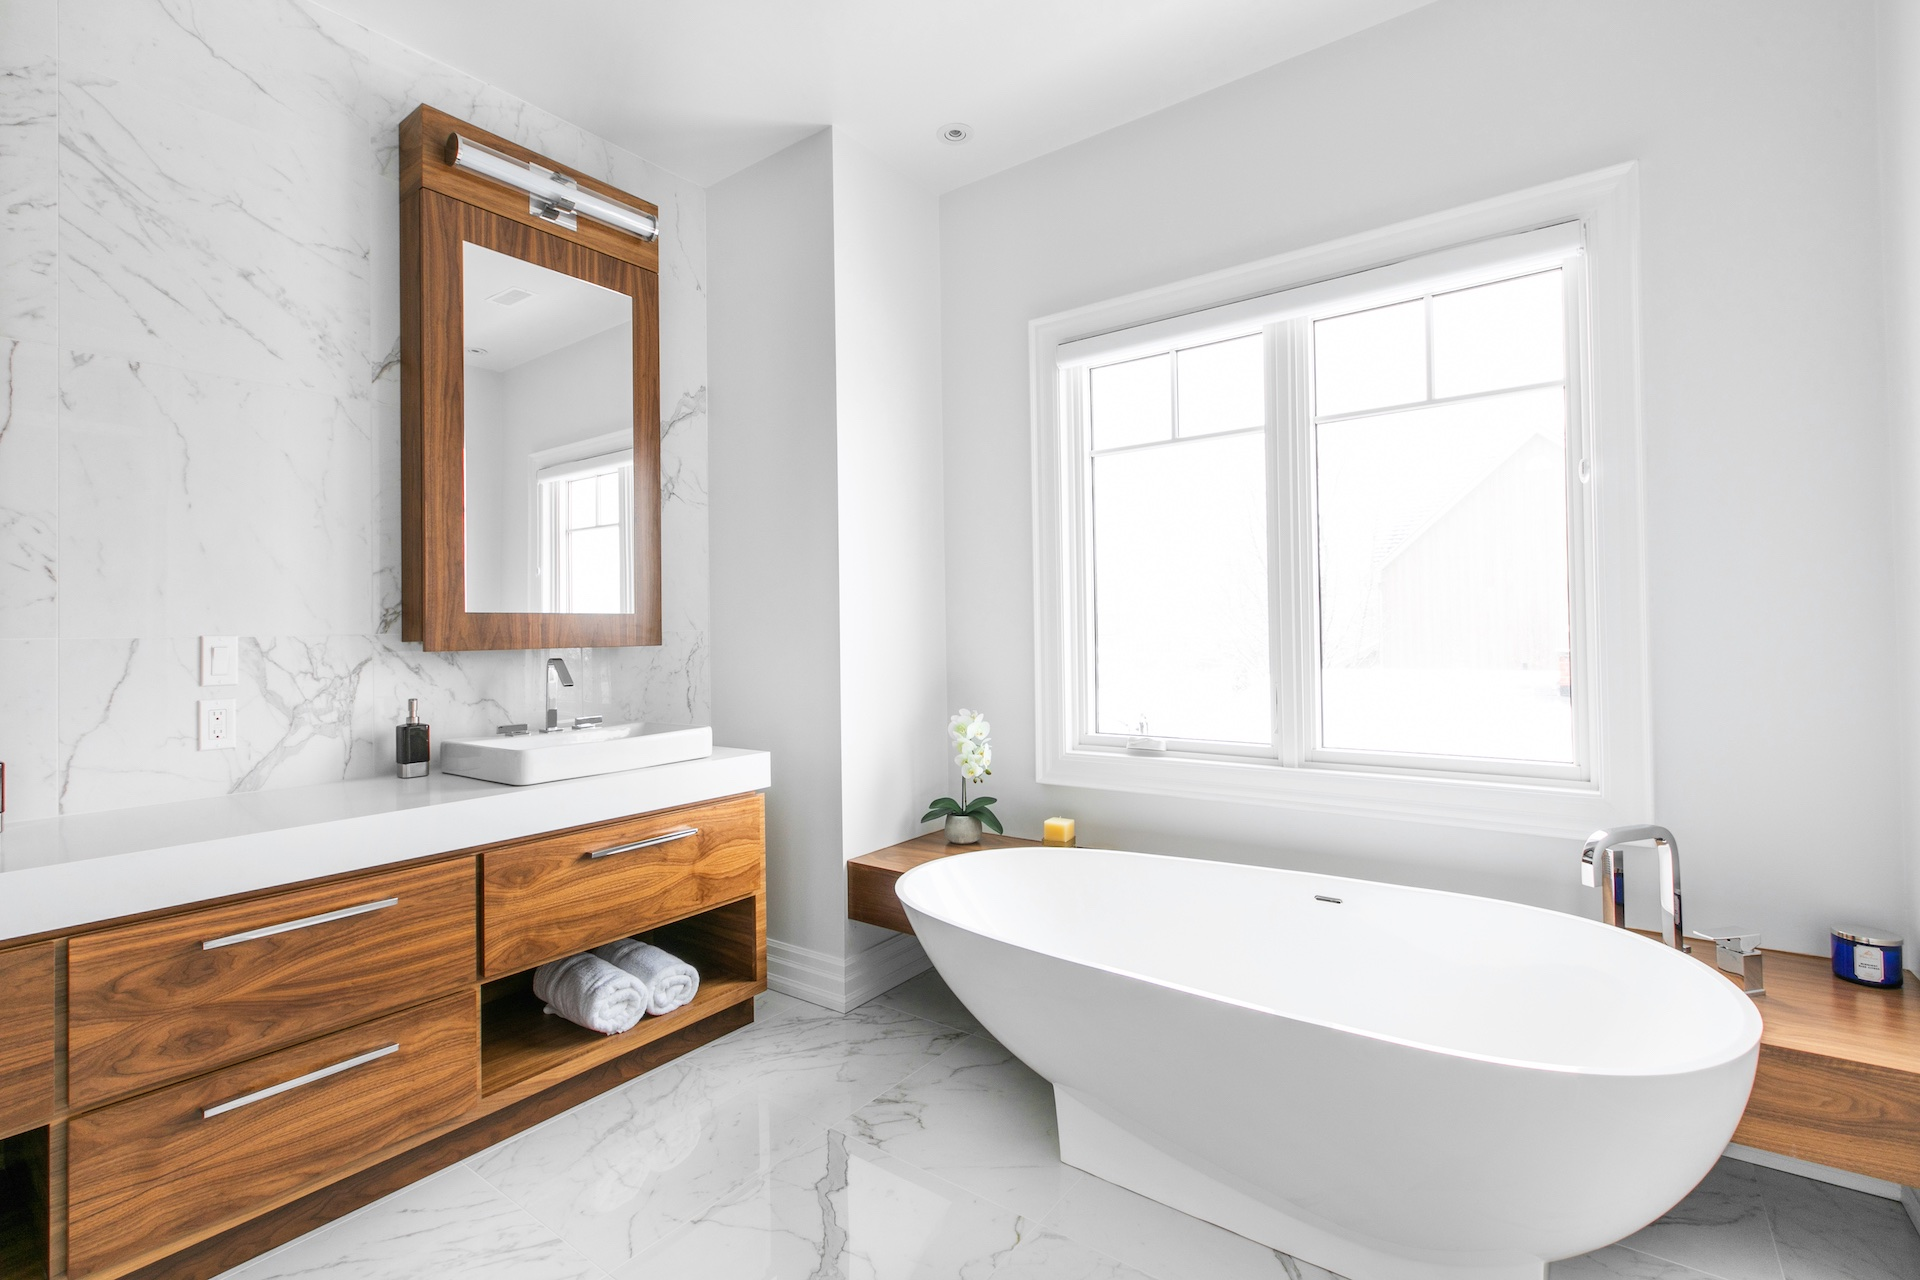 wood vanity and white bath tub